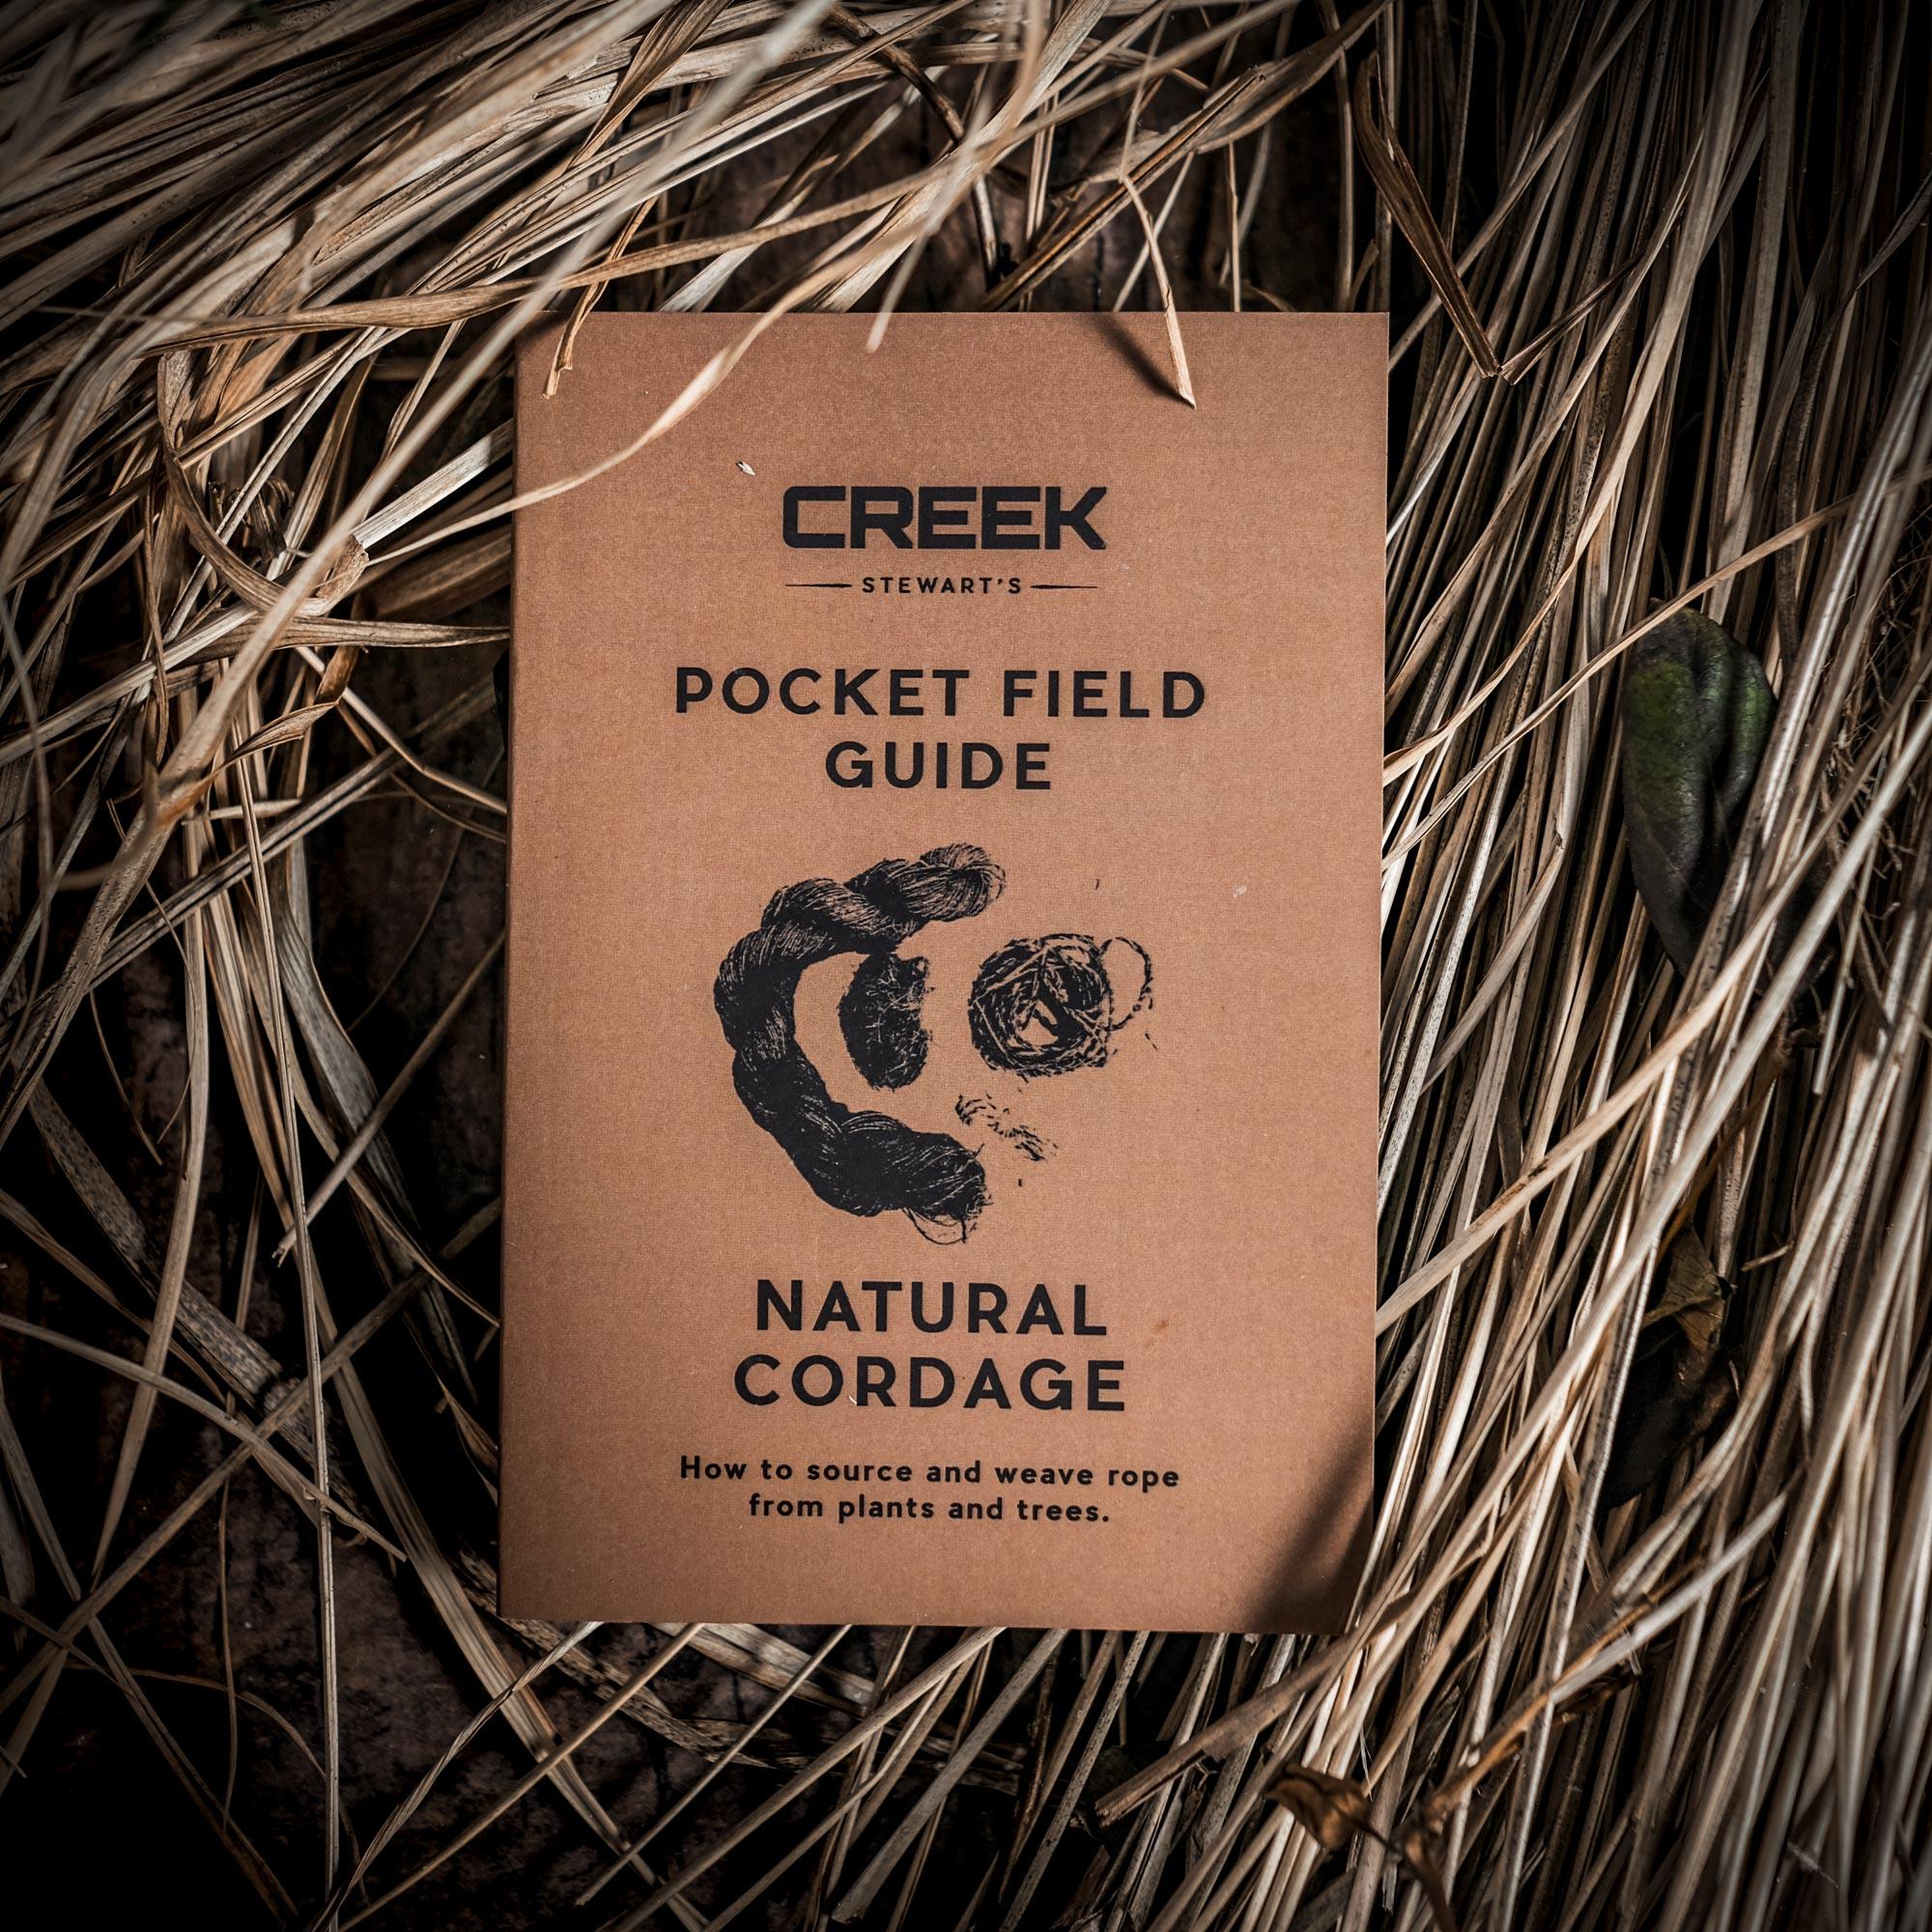 POCKET FIELD GUIDE: Natural Cordage